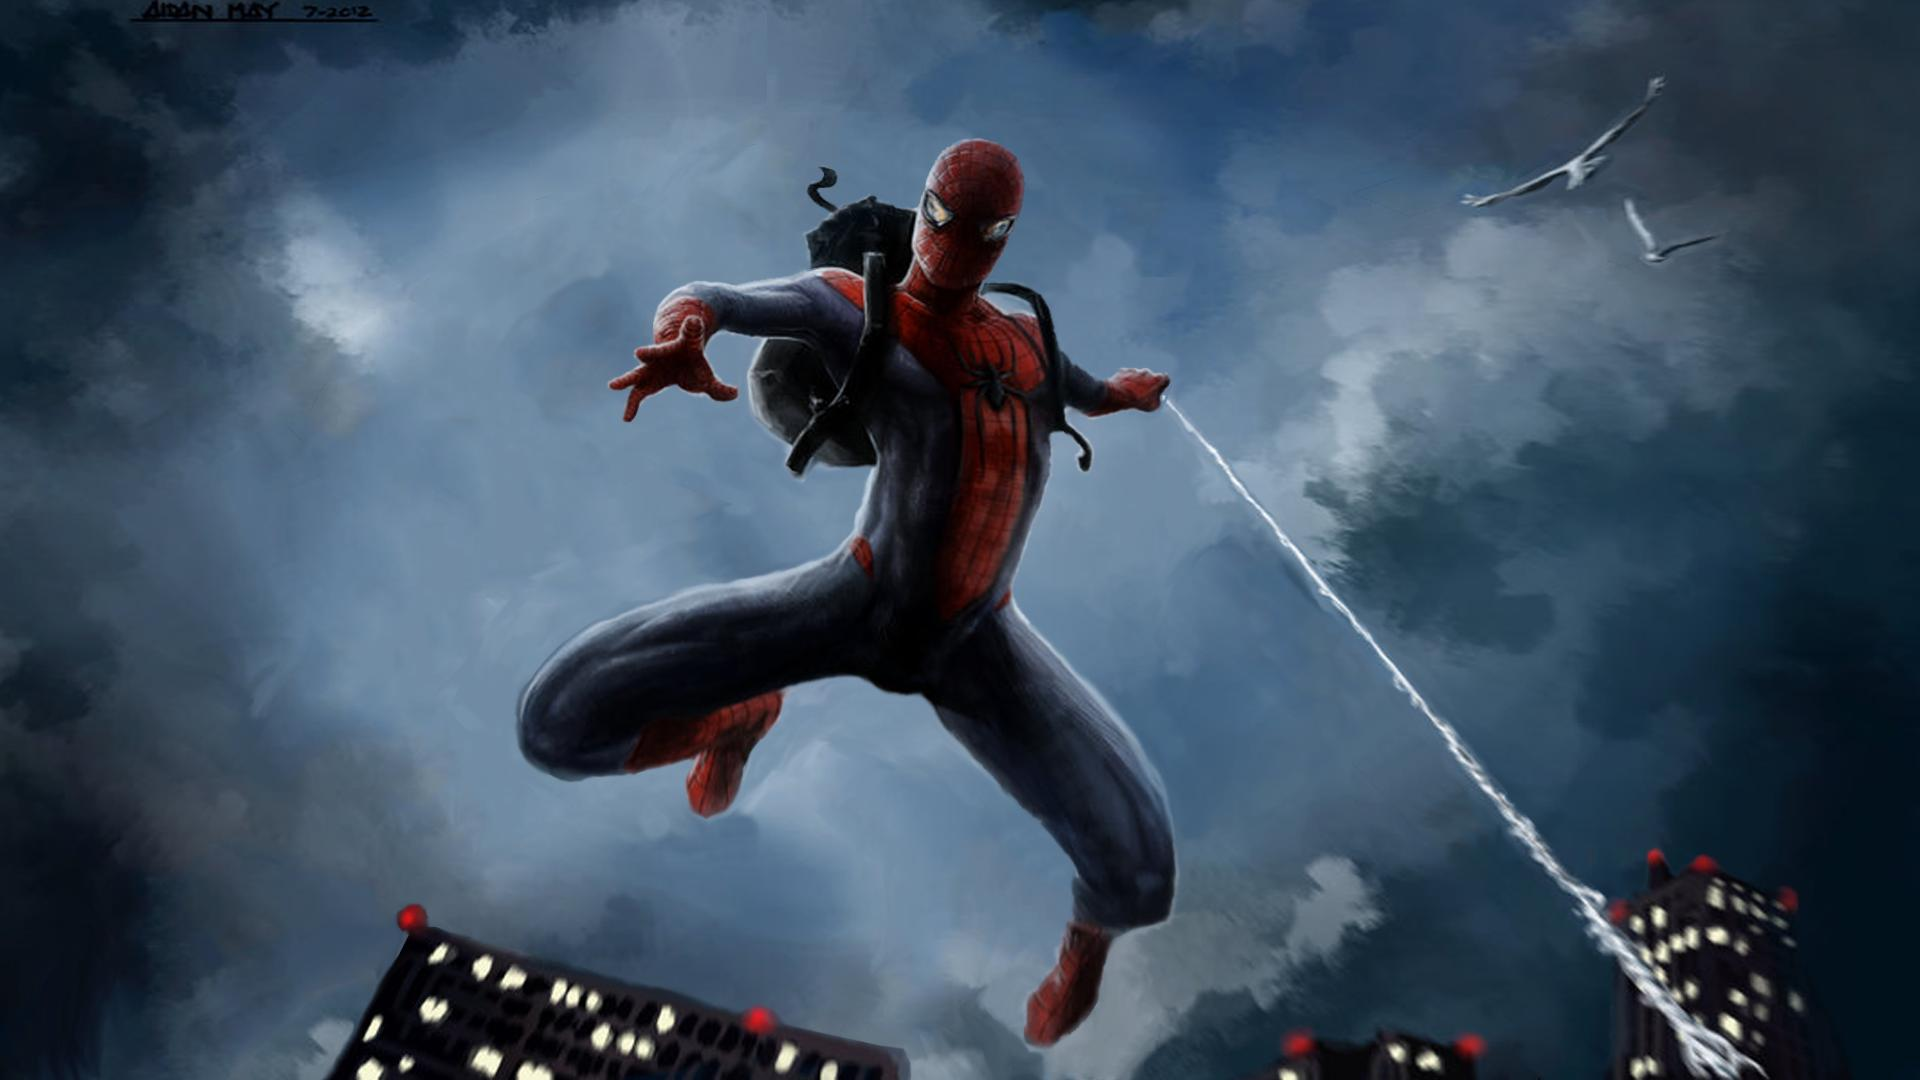 Hd wallpaper spiderman - 40 Amazing Spiderman Wallpaper Hd For Pc